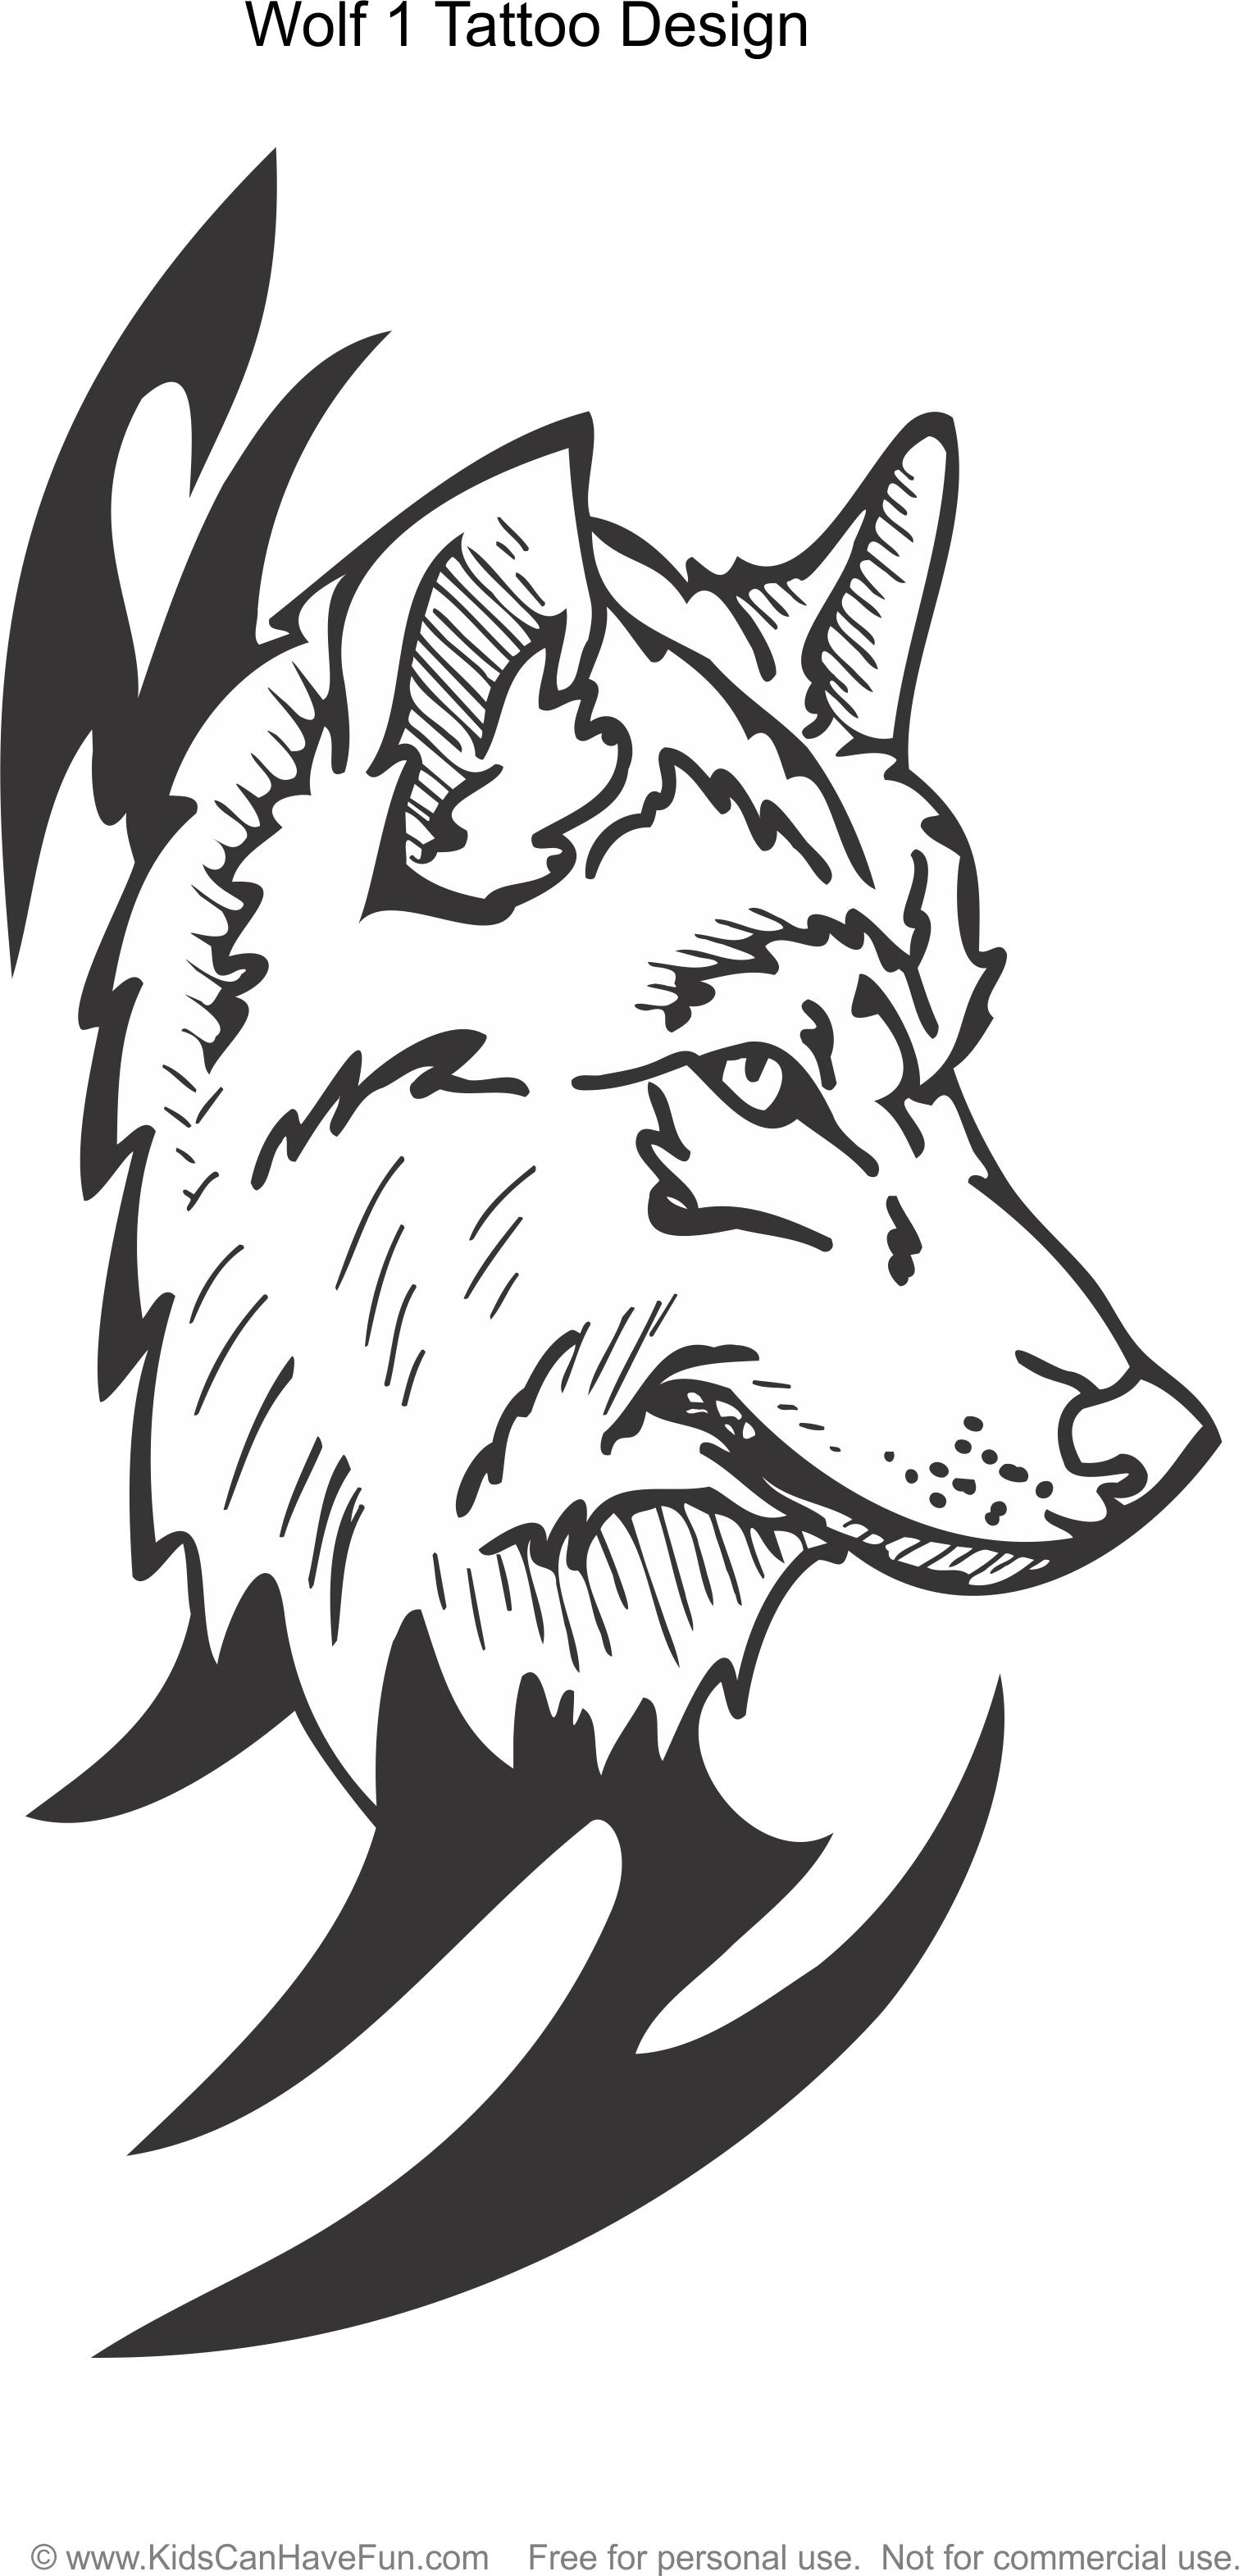 Wolf 1 Tattoo Design coloring page http://www.kidscanhavefun.com ...